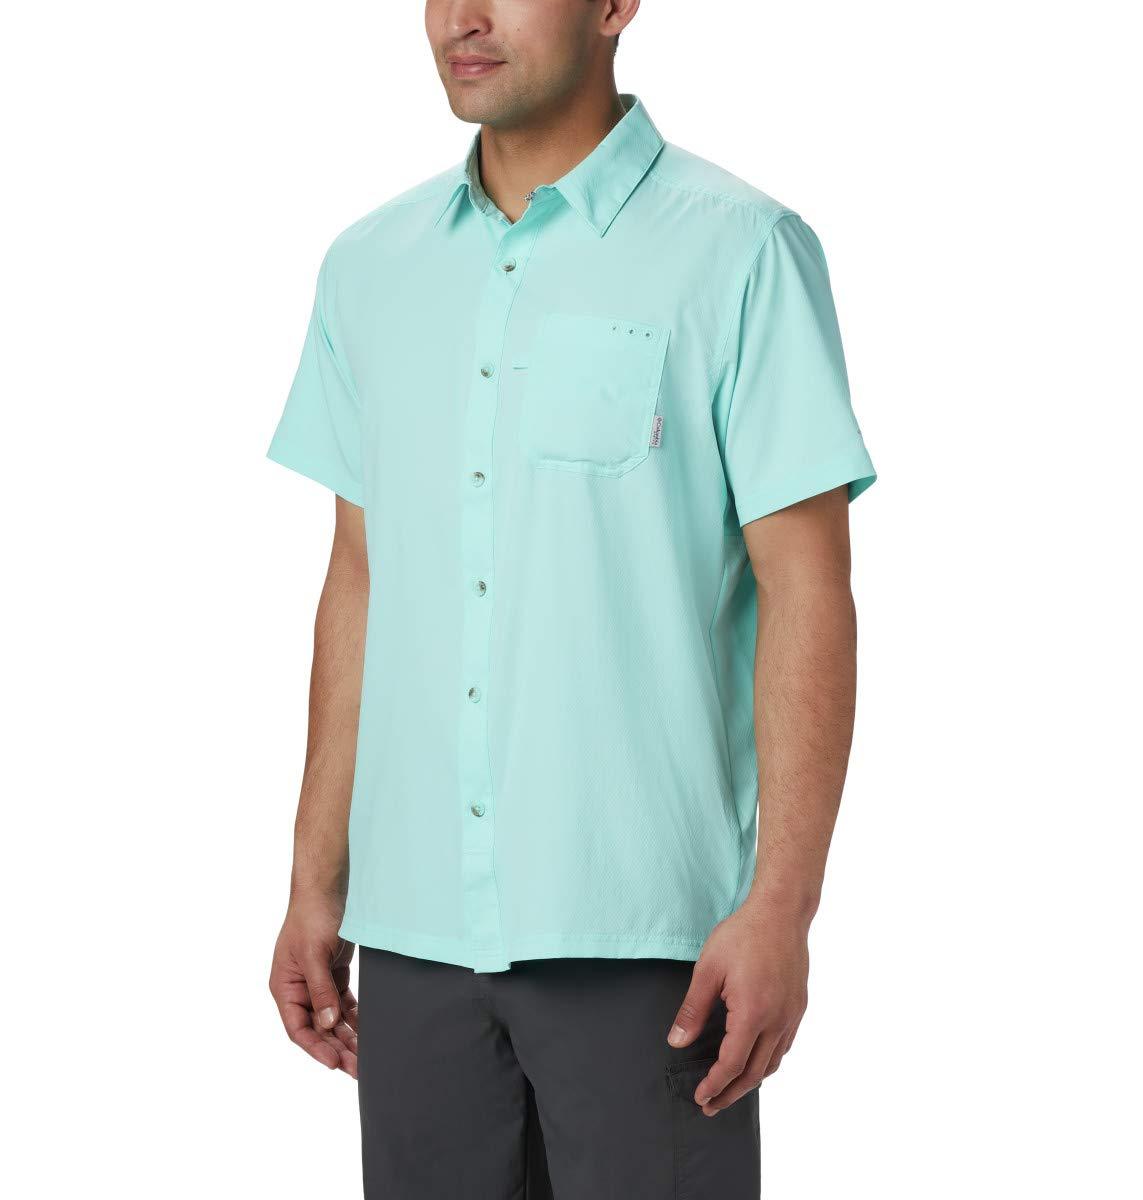 Columbia Sportswear Men's PFG Slack Tide Camp Shirt (Big), Gulf Stream, 4X by Columbia